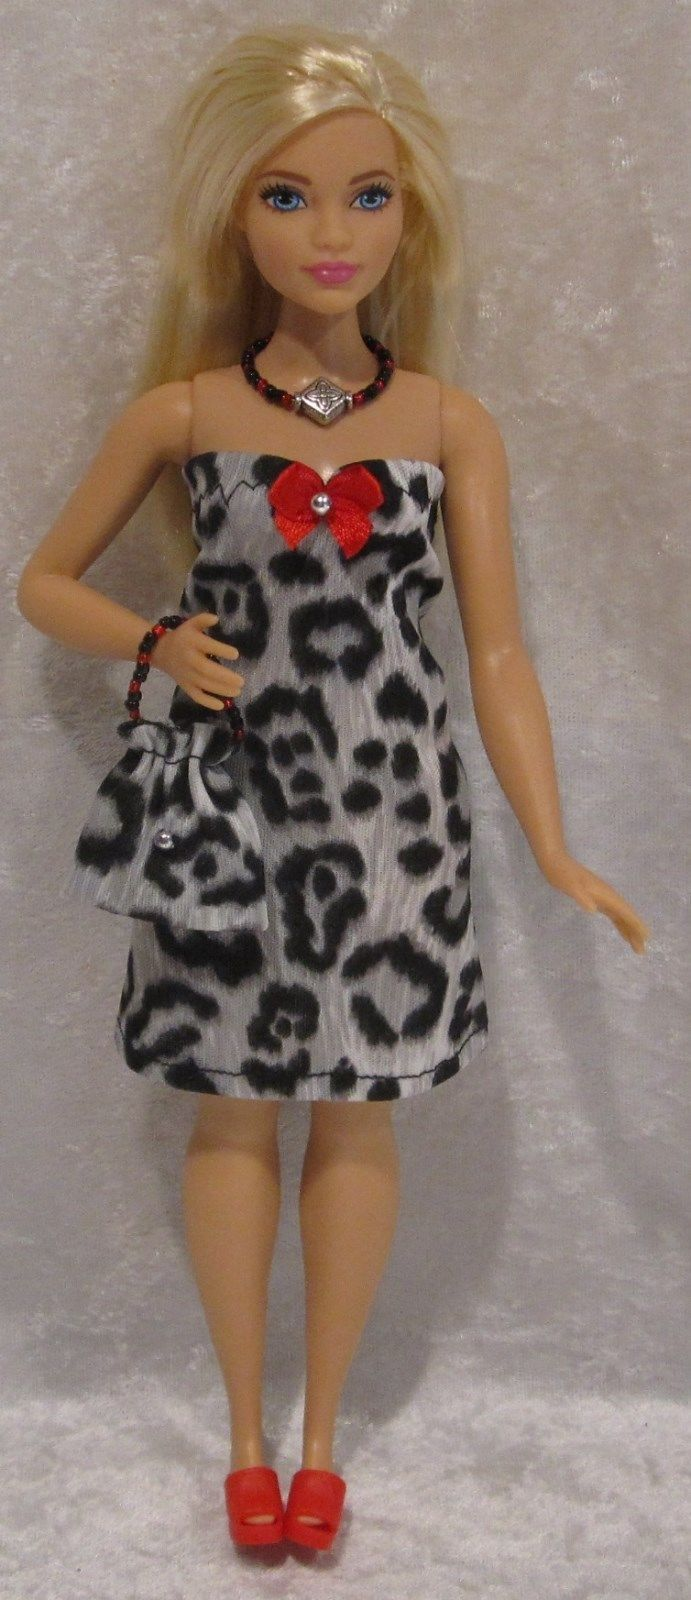 c7be9413d798 Handmade Clothes for Barbie Fashionistas Curvy Dolls Dress Purse Necklace  05